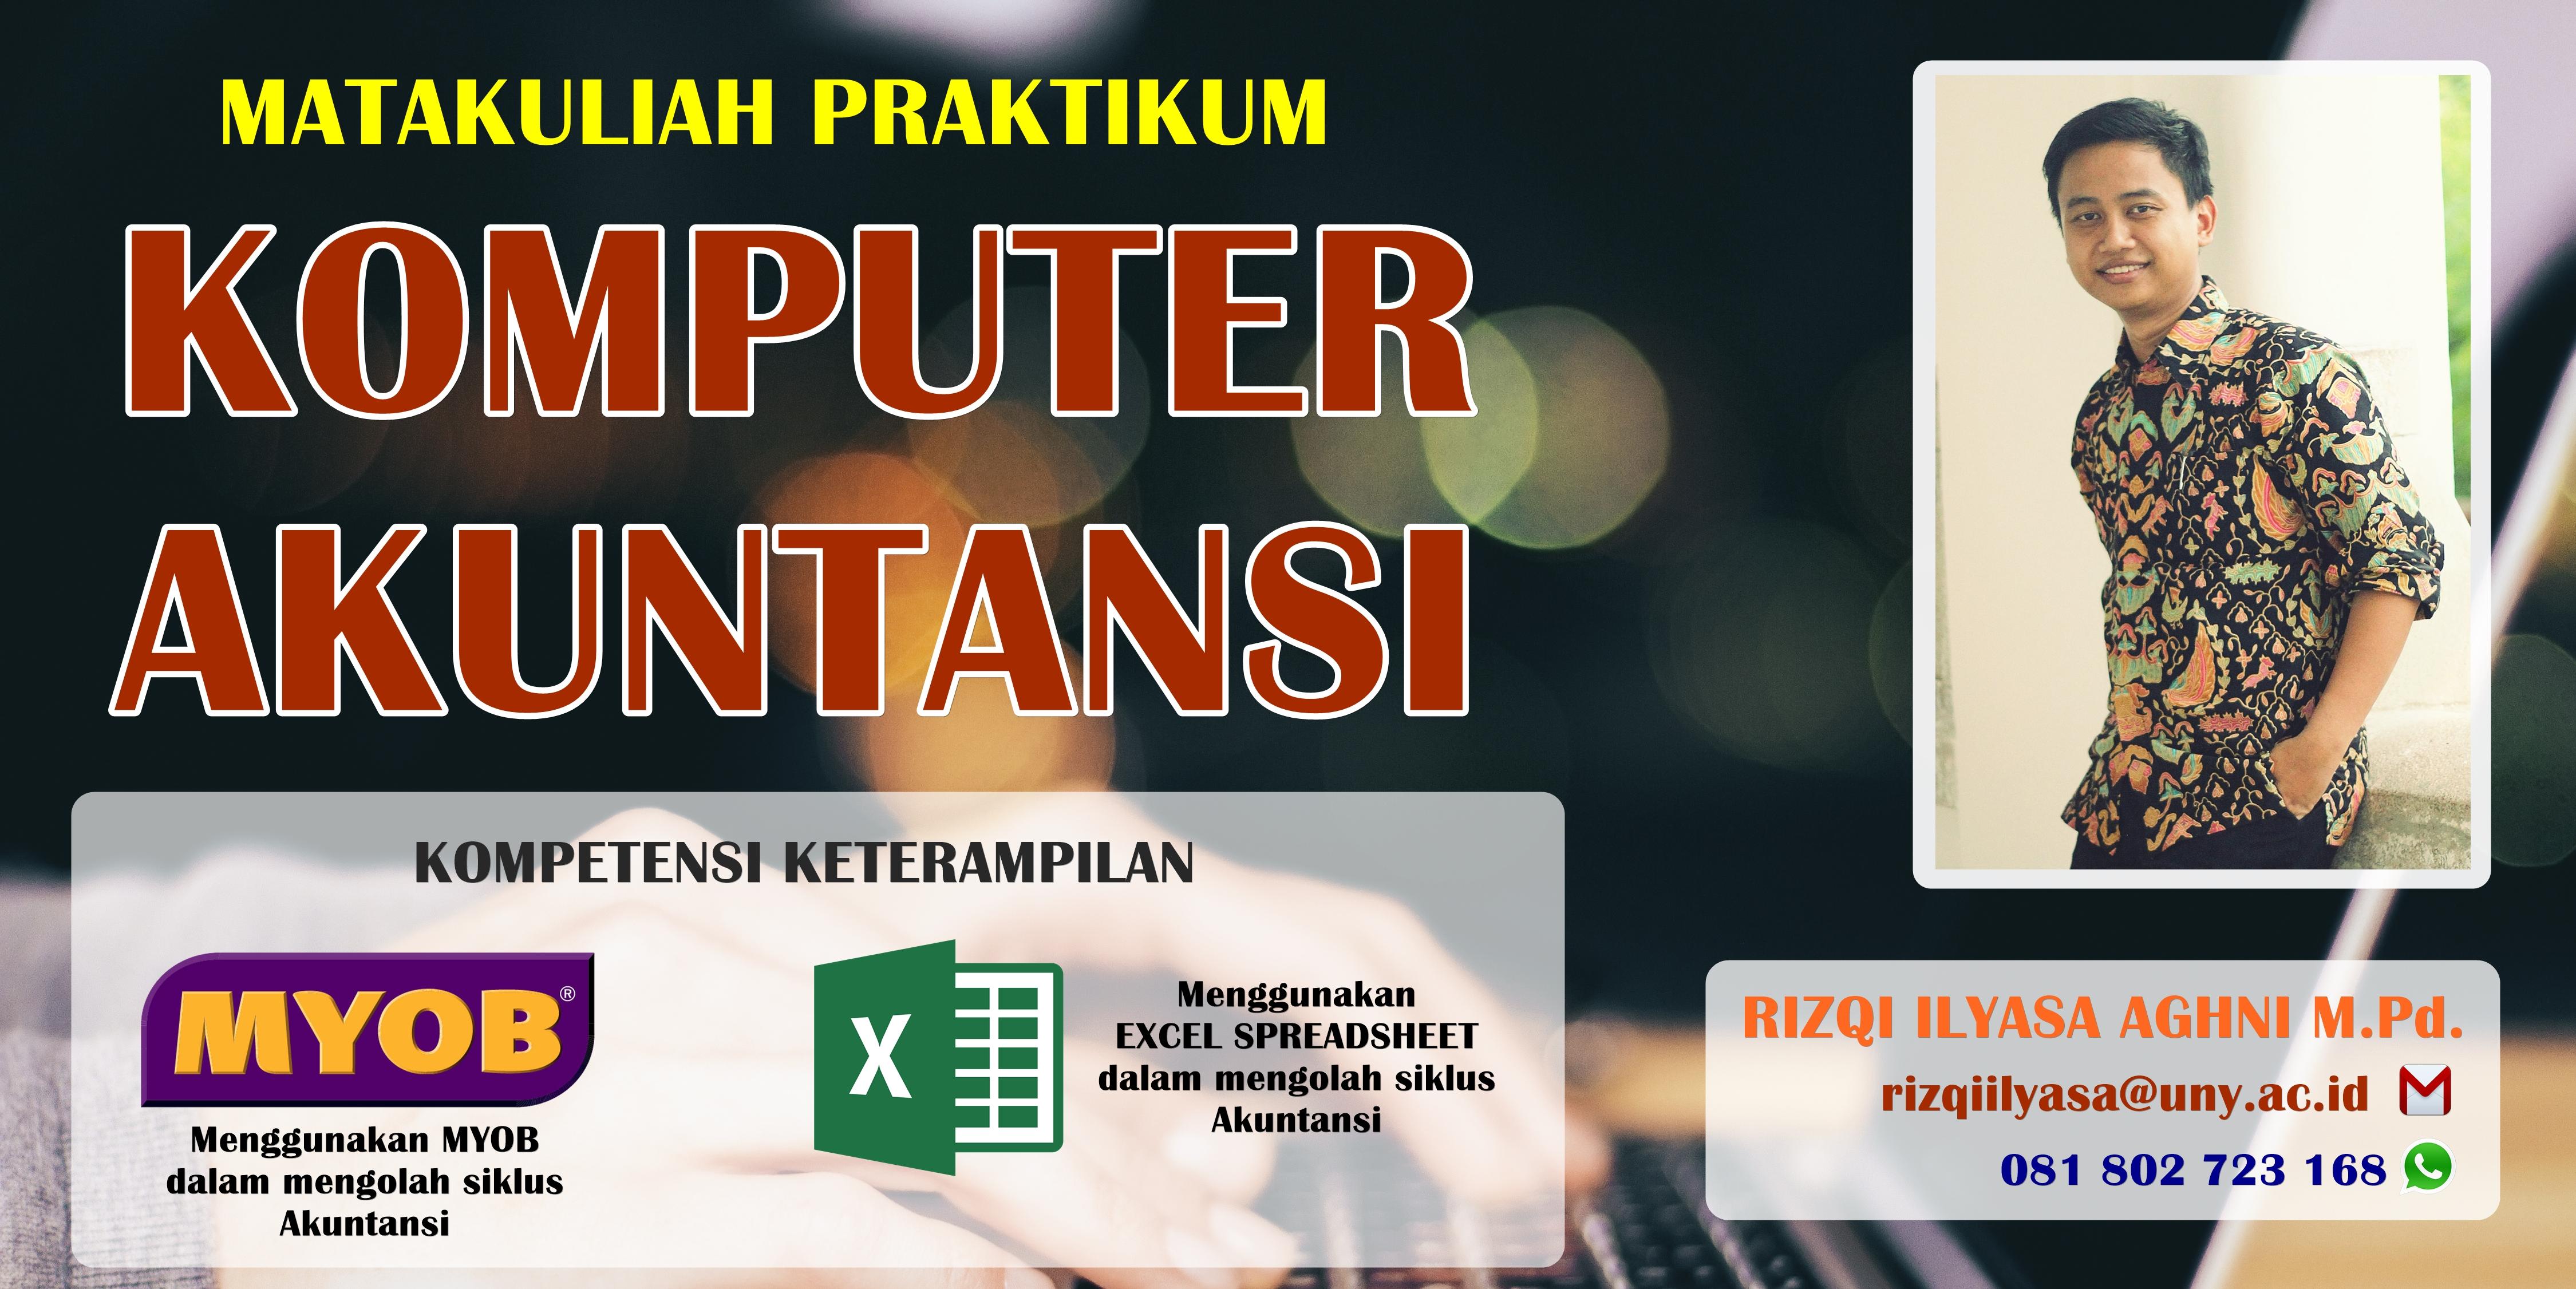 Komputer Akuntansi (S1 DIKSI- Rizqi Ilyasa Aghni - SPADA RI)